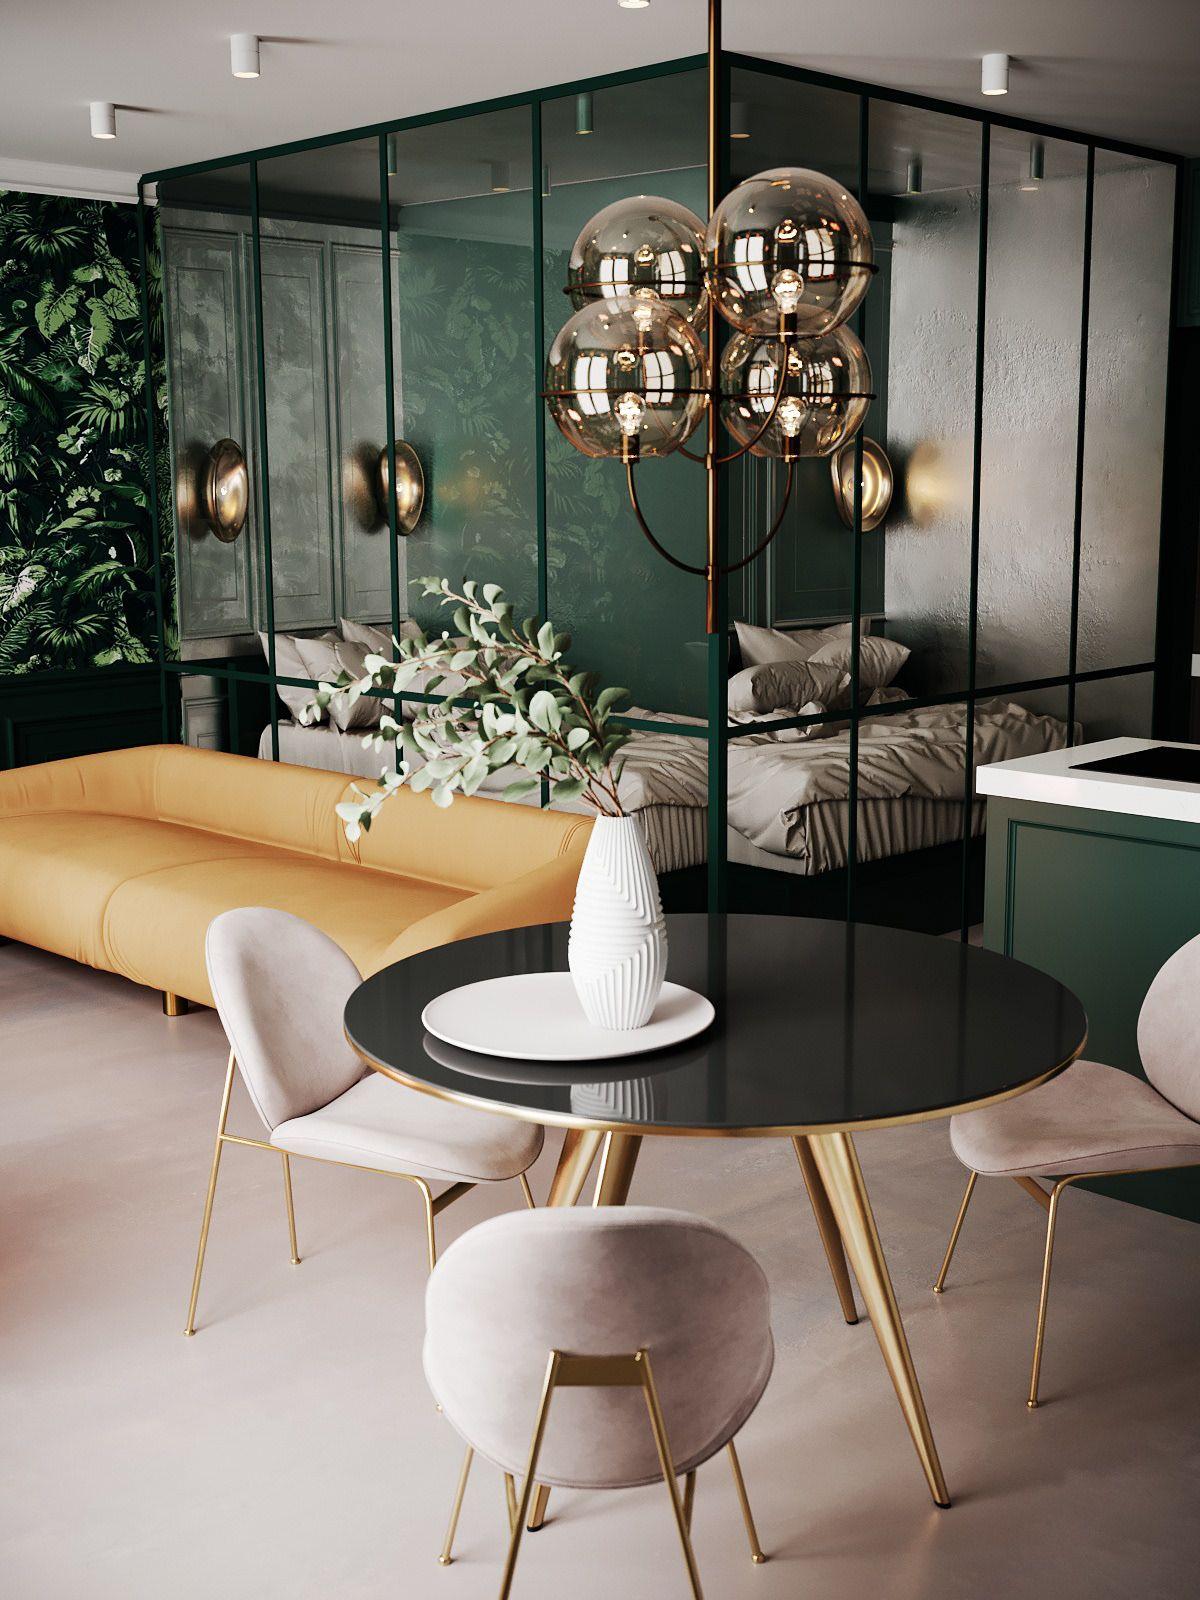 Tiny Home Small Apartment Ideas Green Bedroom Sofa Home